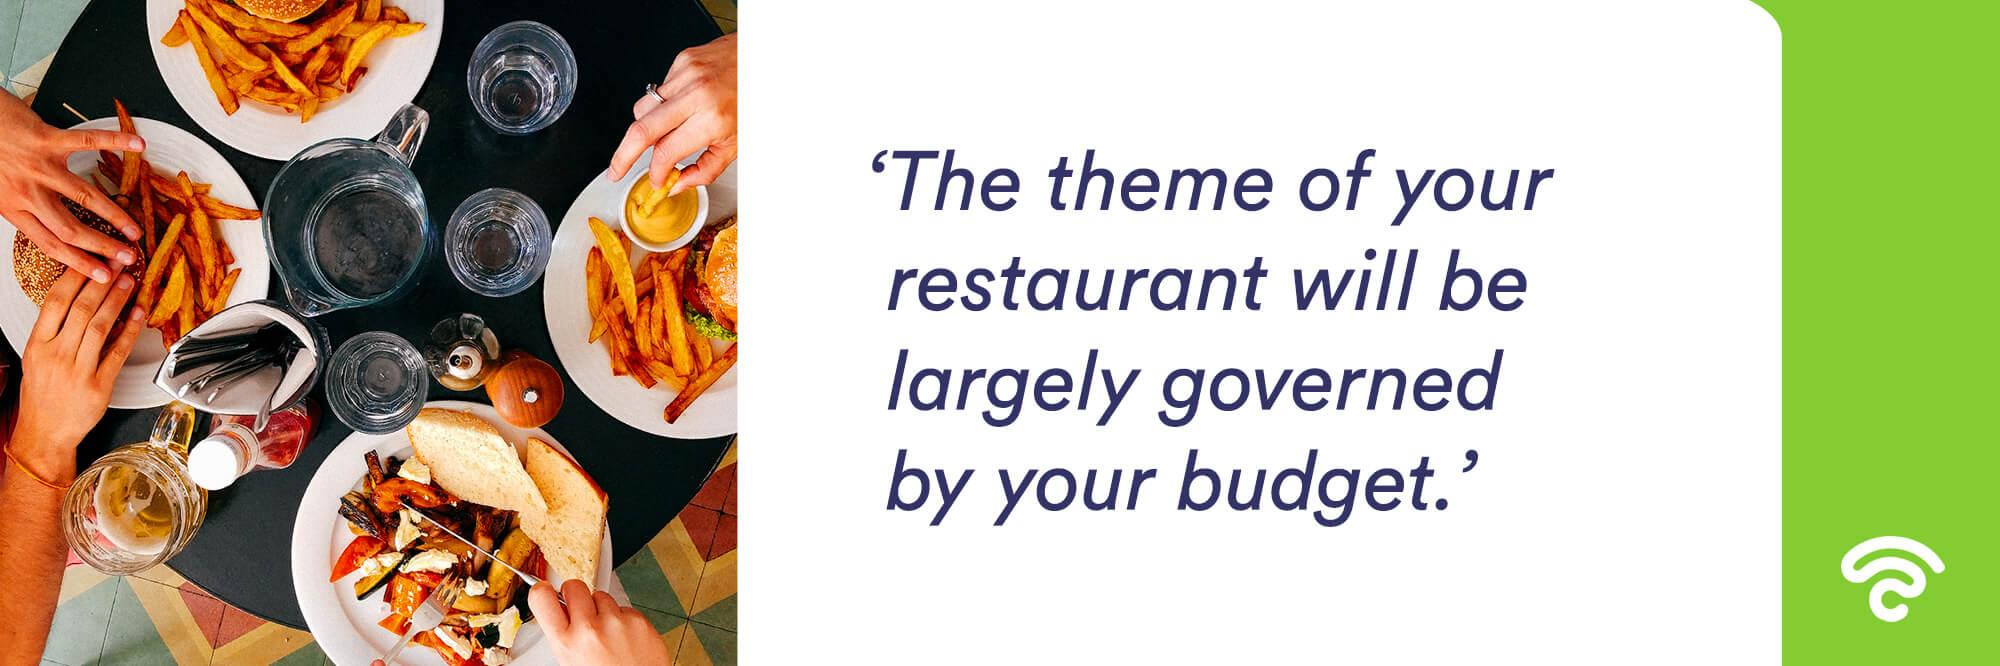 Budget for restaurant